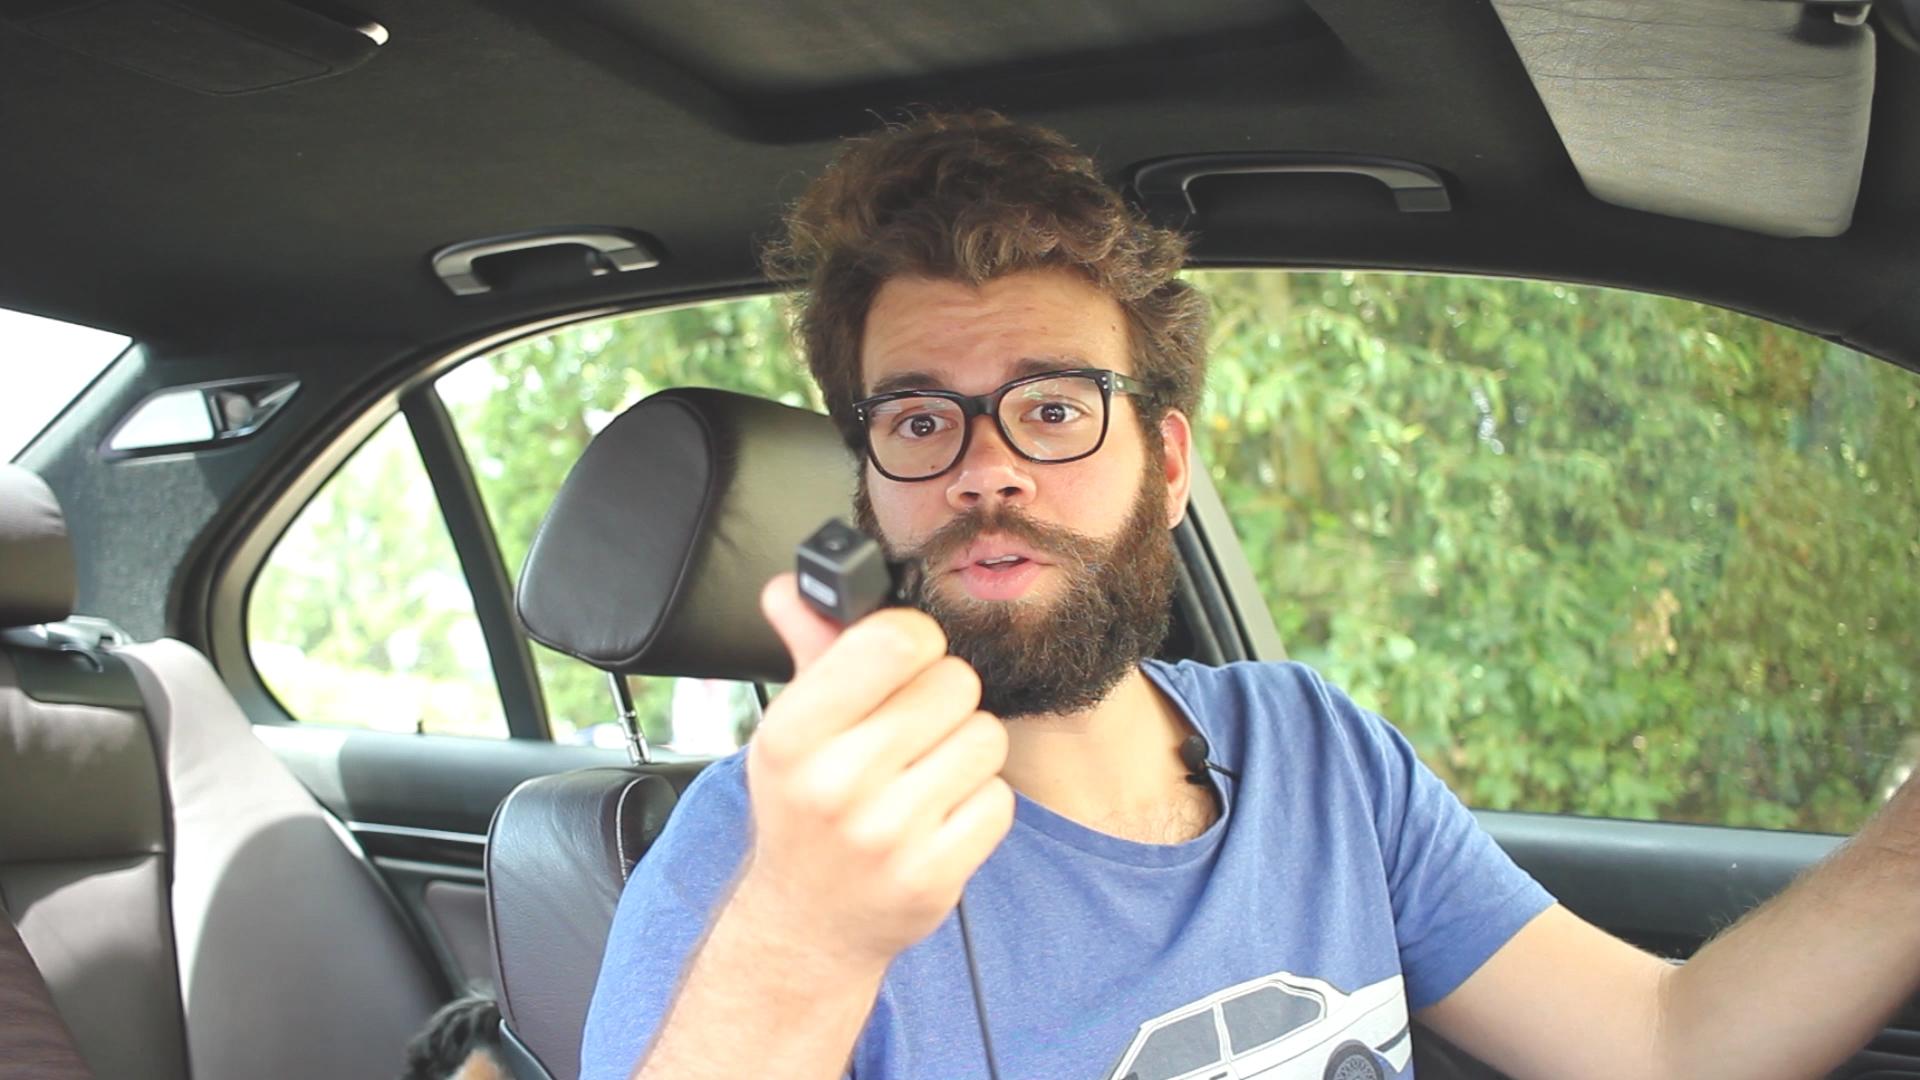 MÖmus BMW E39 Android Navigation Install Back Up Camera Mugshot.jpg